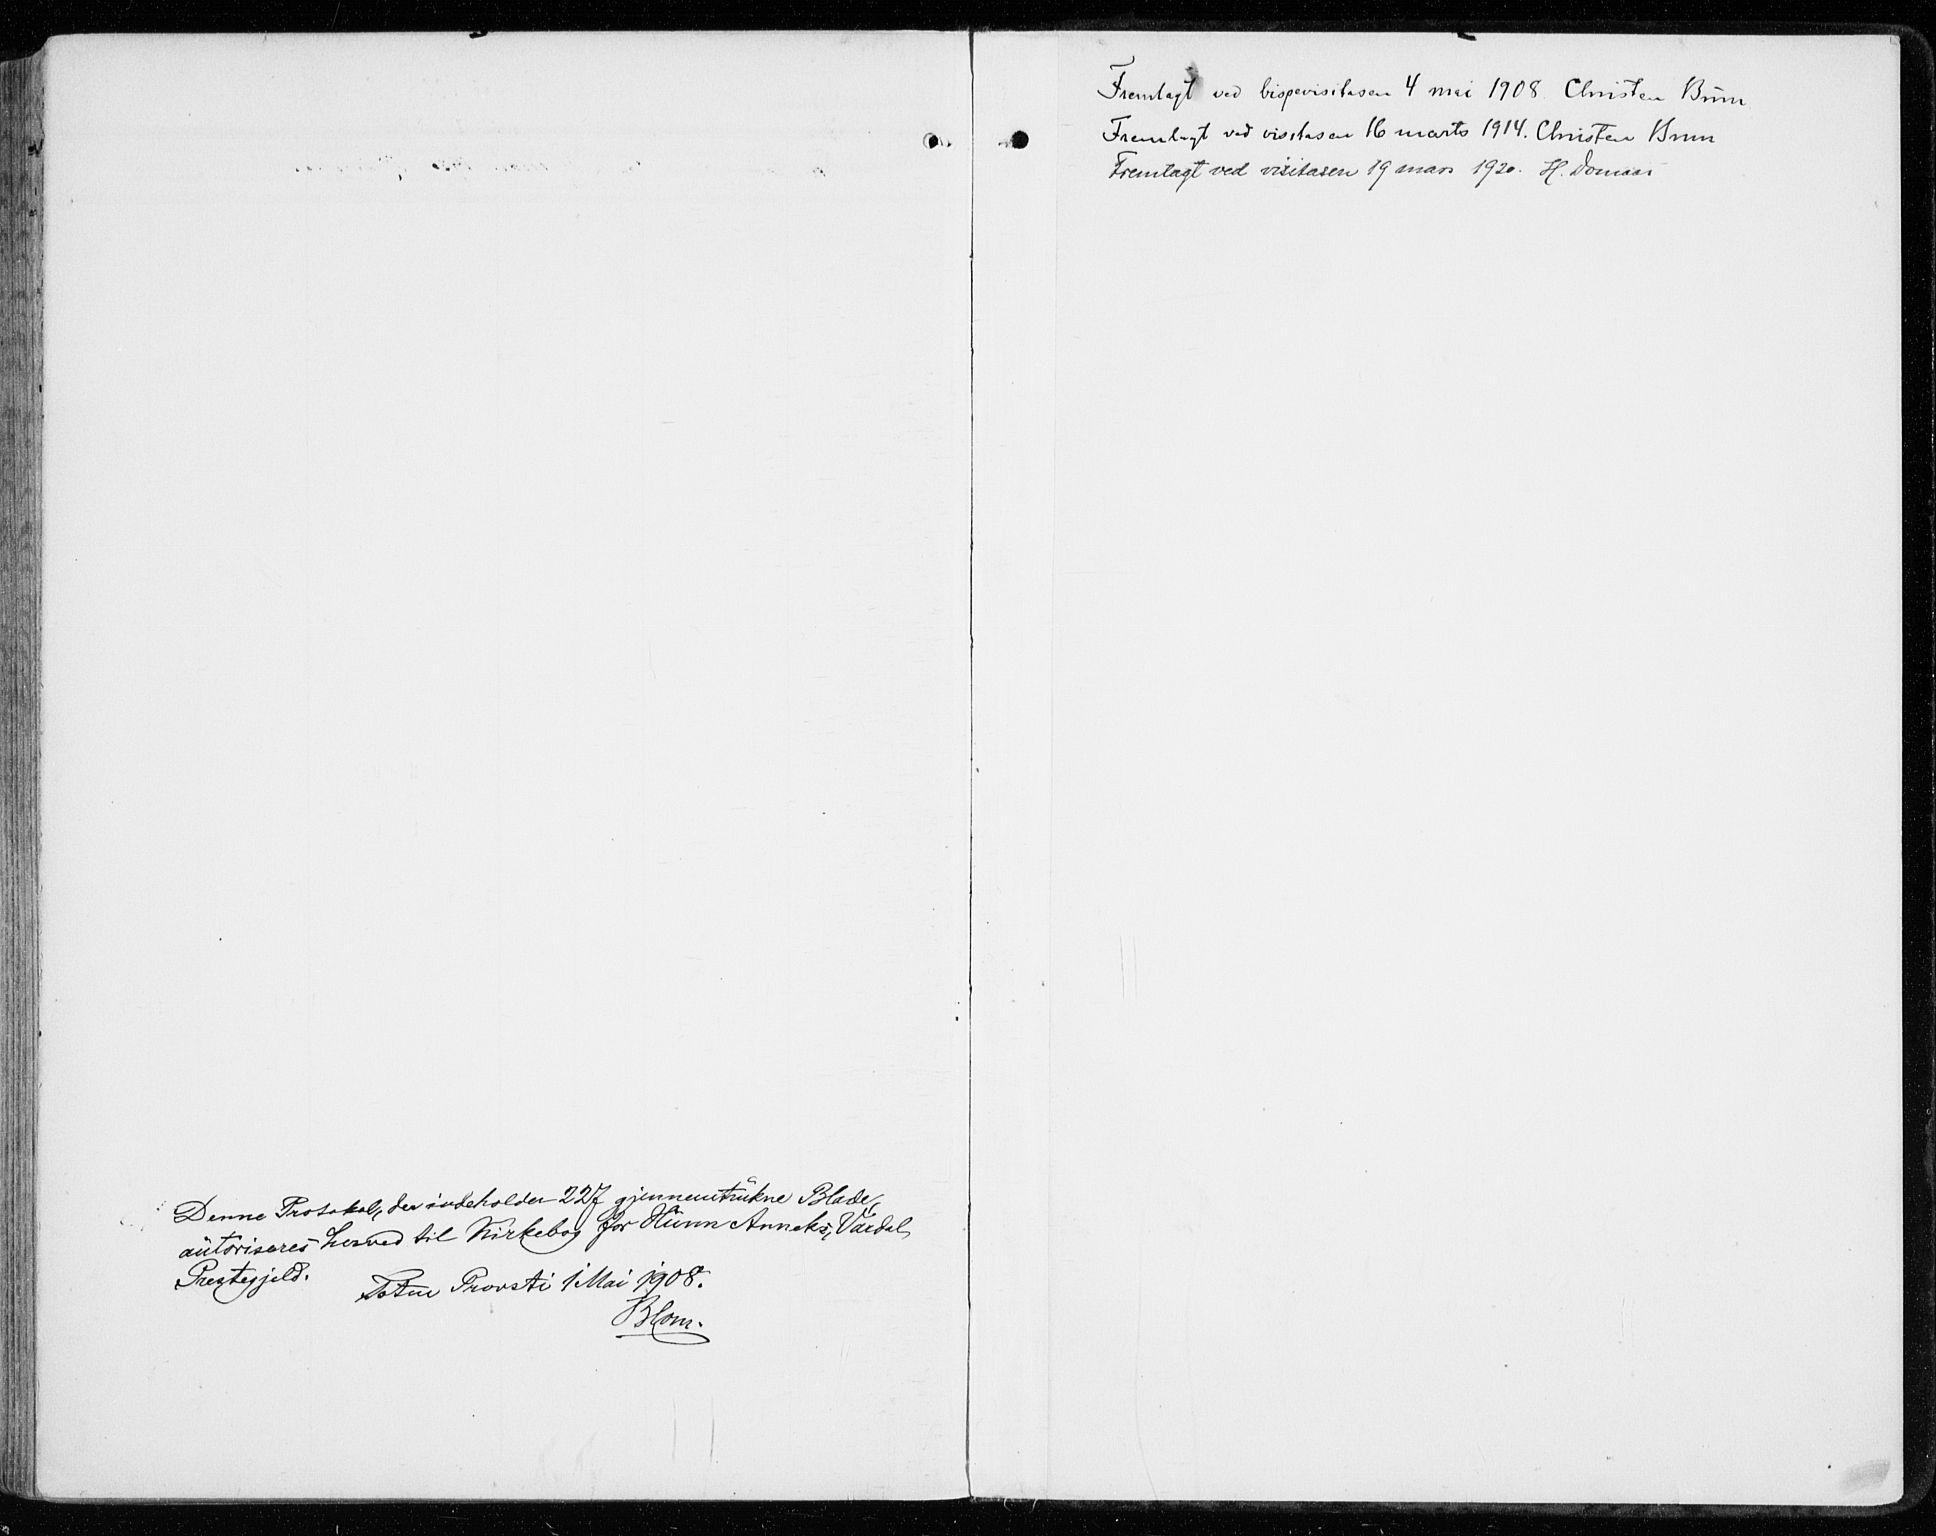 SAH, Vardal prestekontor, H/Ha/Haa/L0016: Ministerialbok nr. 16, 1904-1916